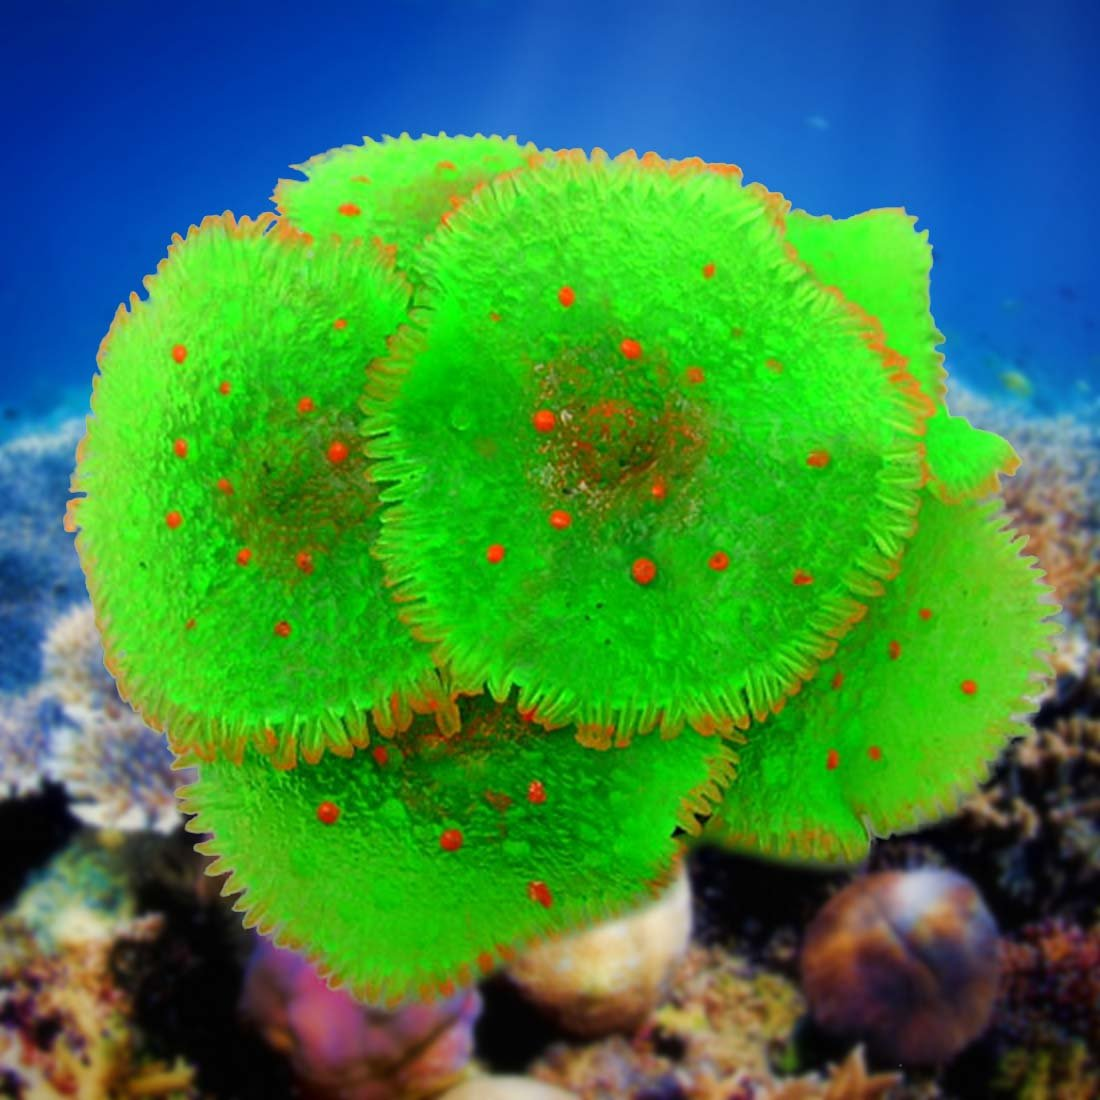 Joylive Aquarium Fish Tank Decoration Artificial Resin Coral Plant Underwater Ornament